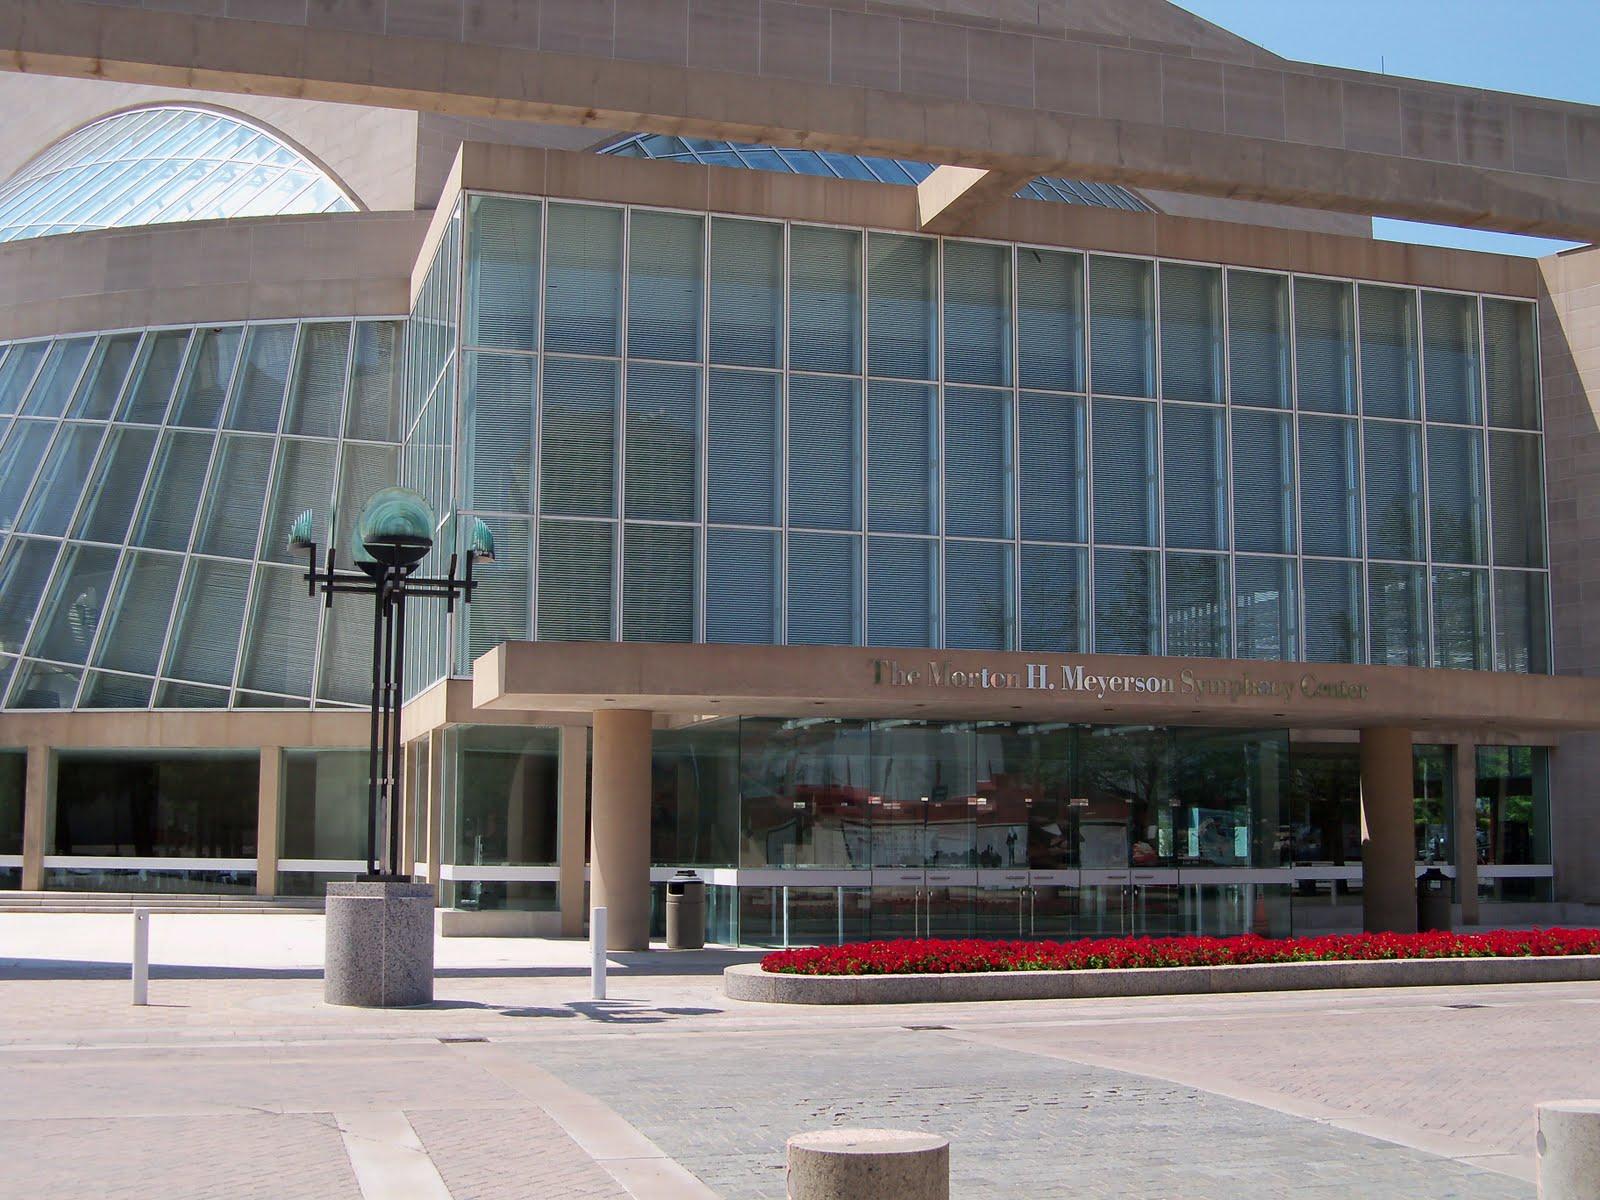 Dallas Fort Worth vacation - 100_9851.JPG